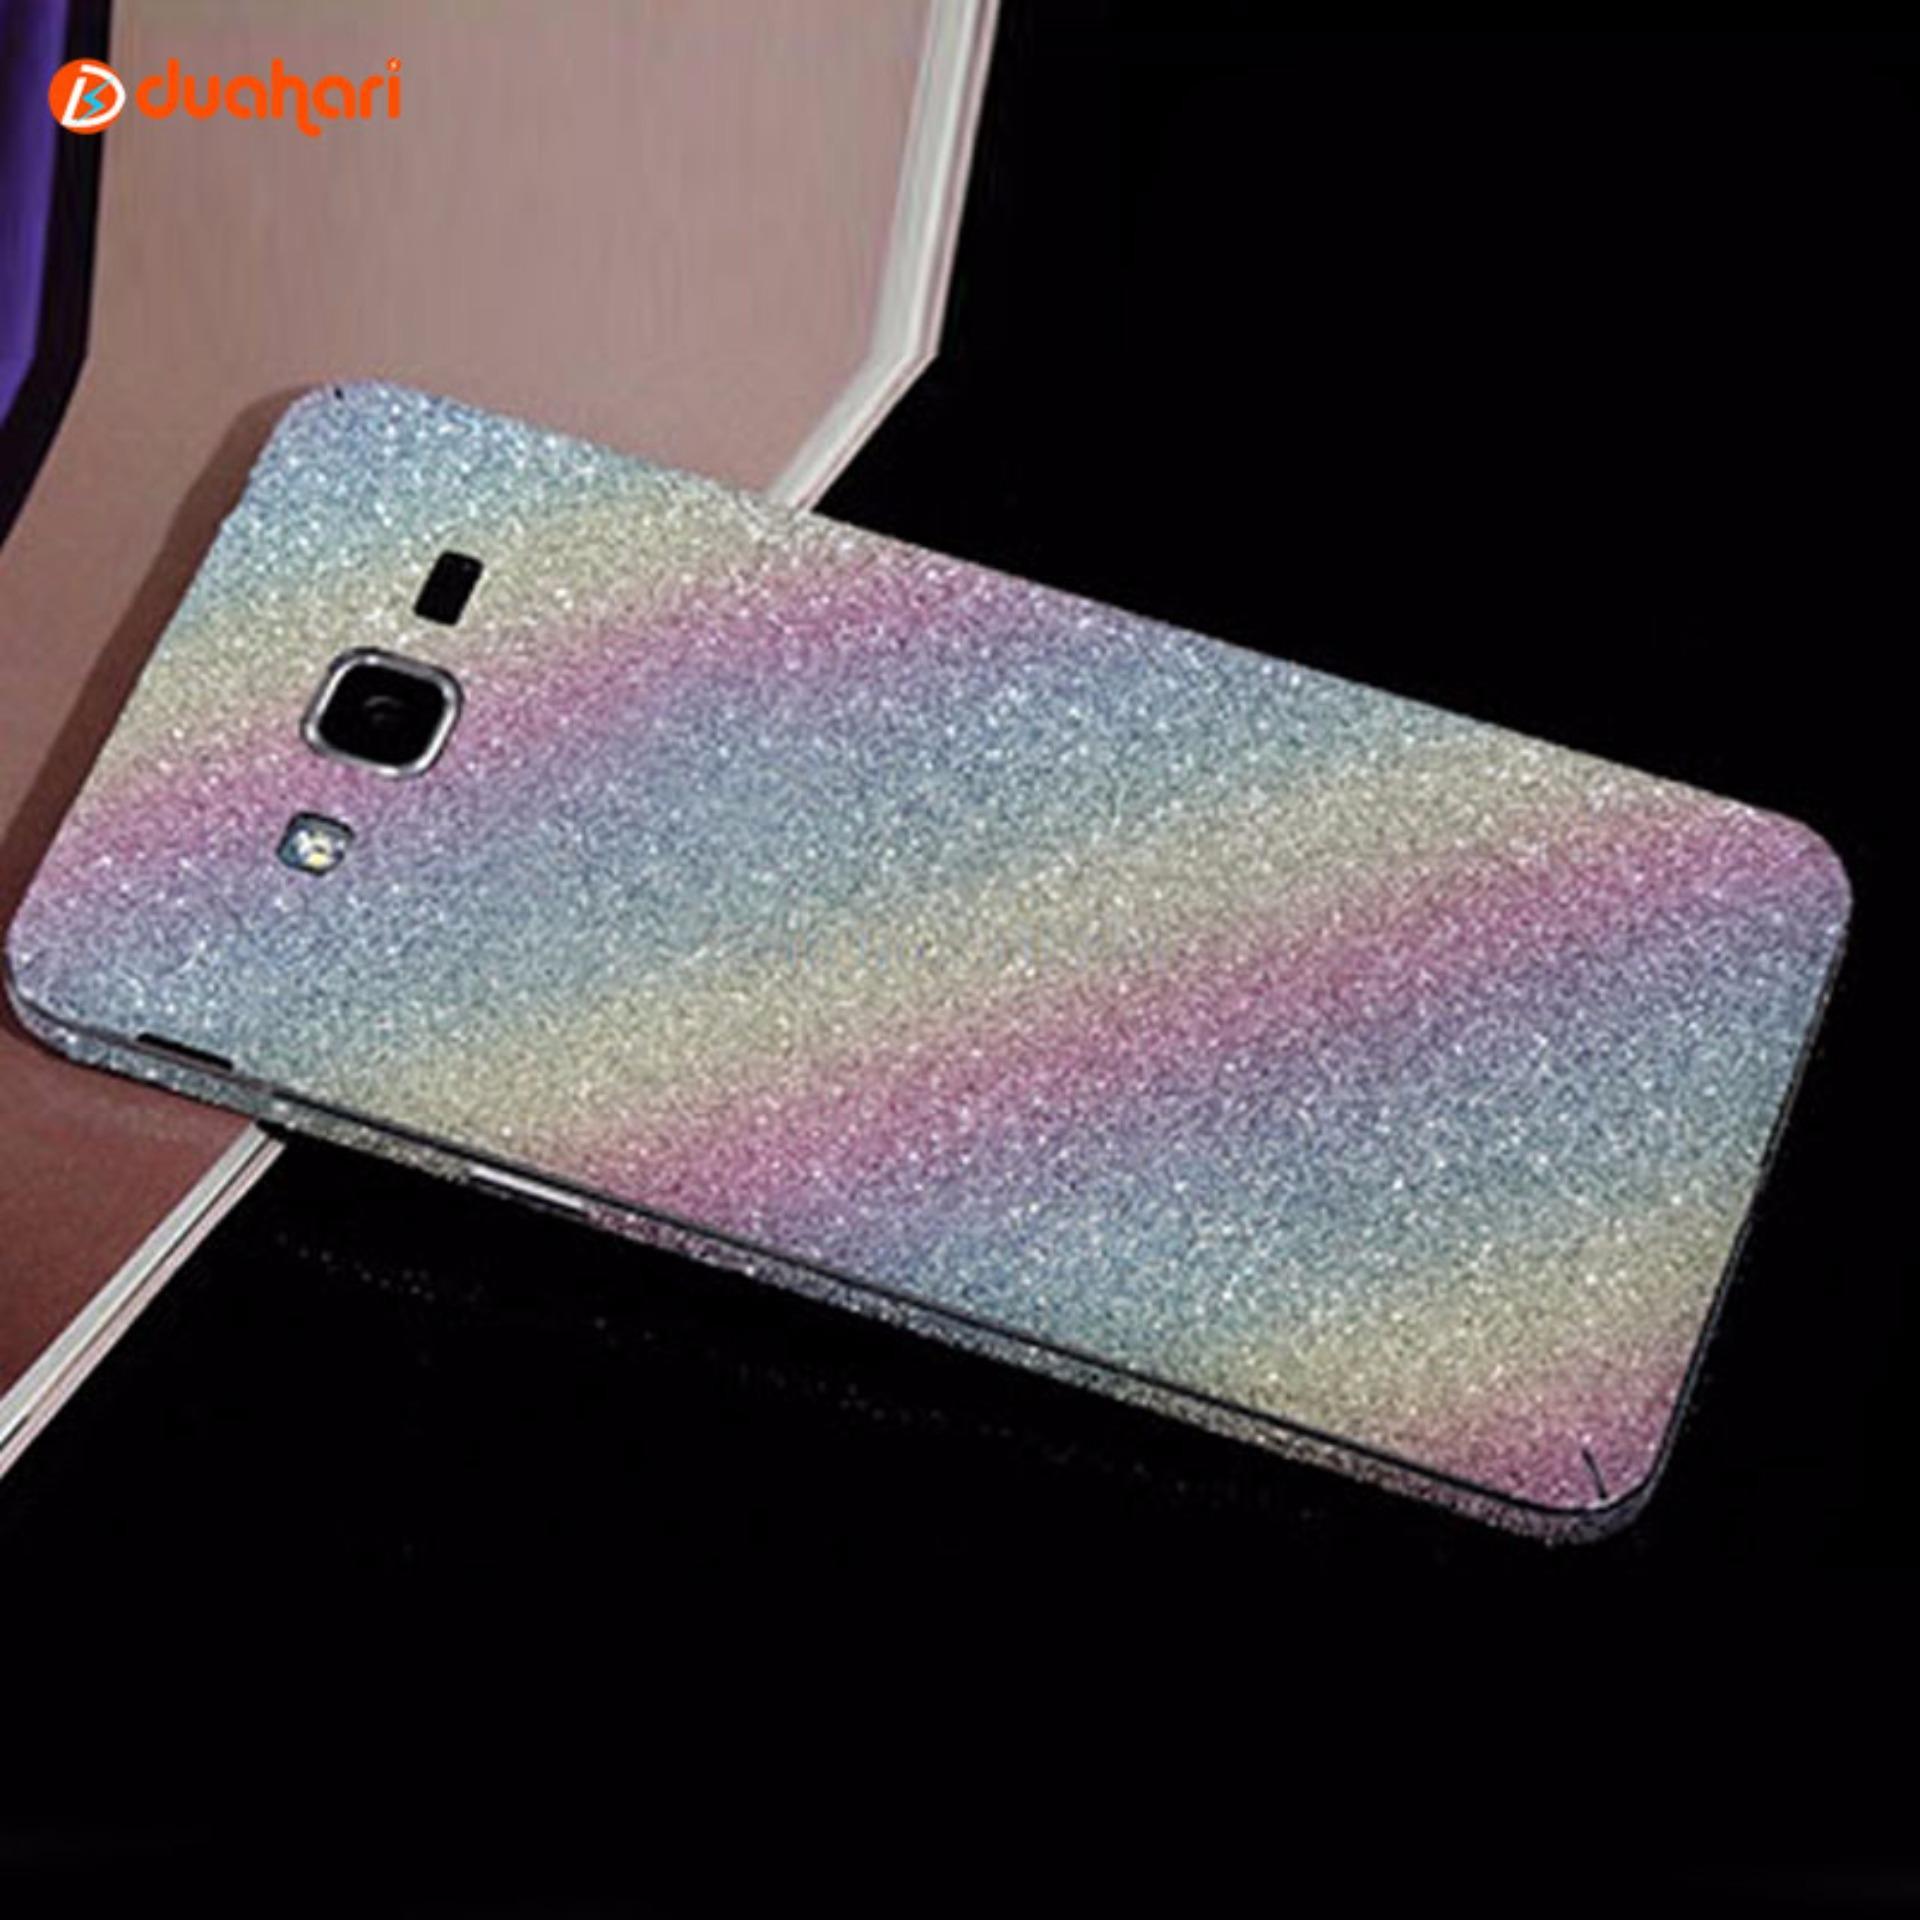 Harga Dan Spek Lolypoly Case Glitter 92 Iphone 5 Termurah 2018 Flipcase Leather 6 Cokelat 6s Skin Garskin Sticker Cover Daftar Samsung Galaxy J2